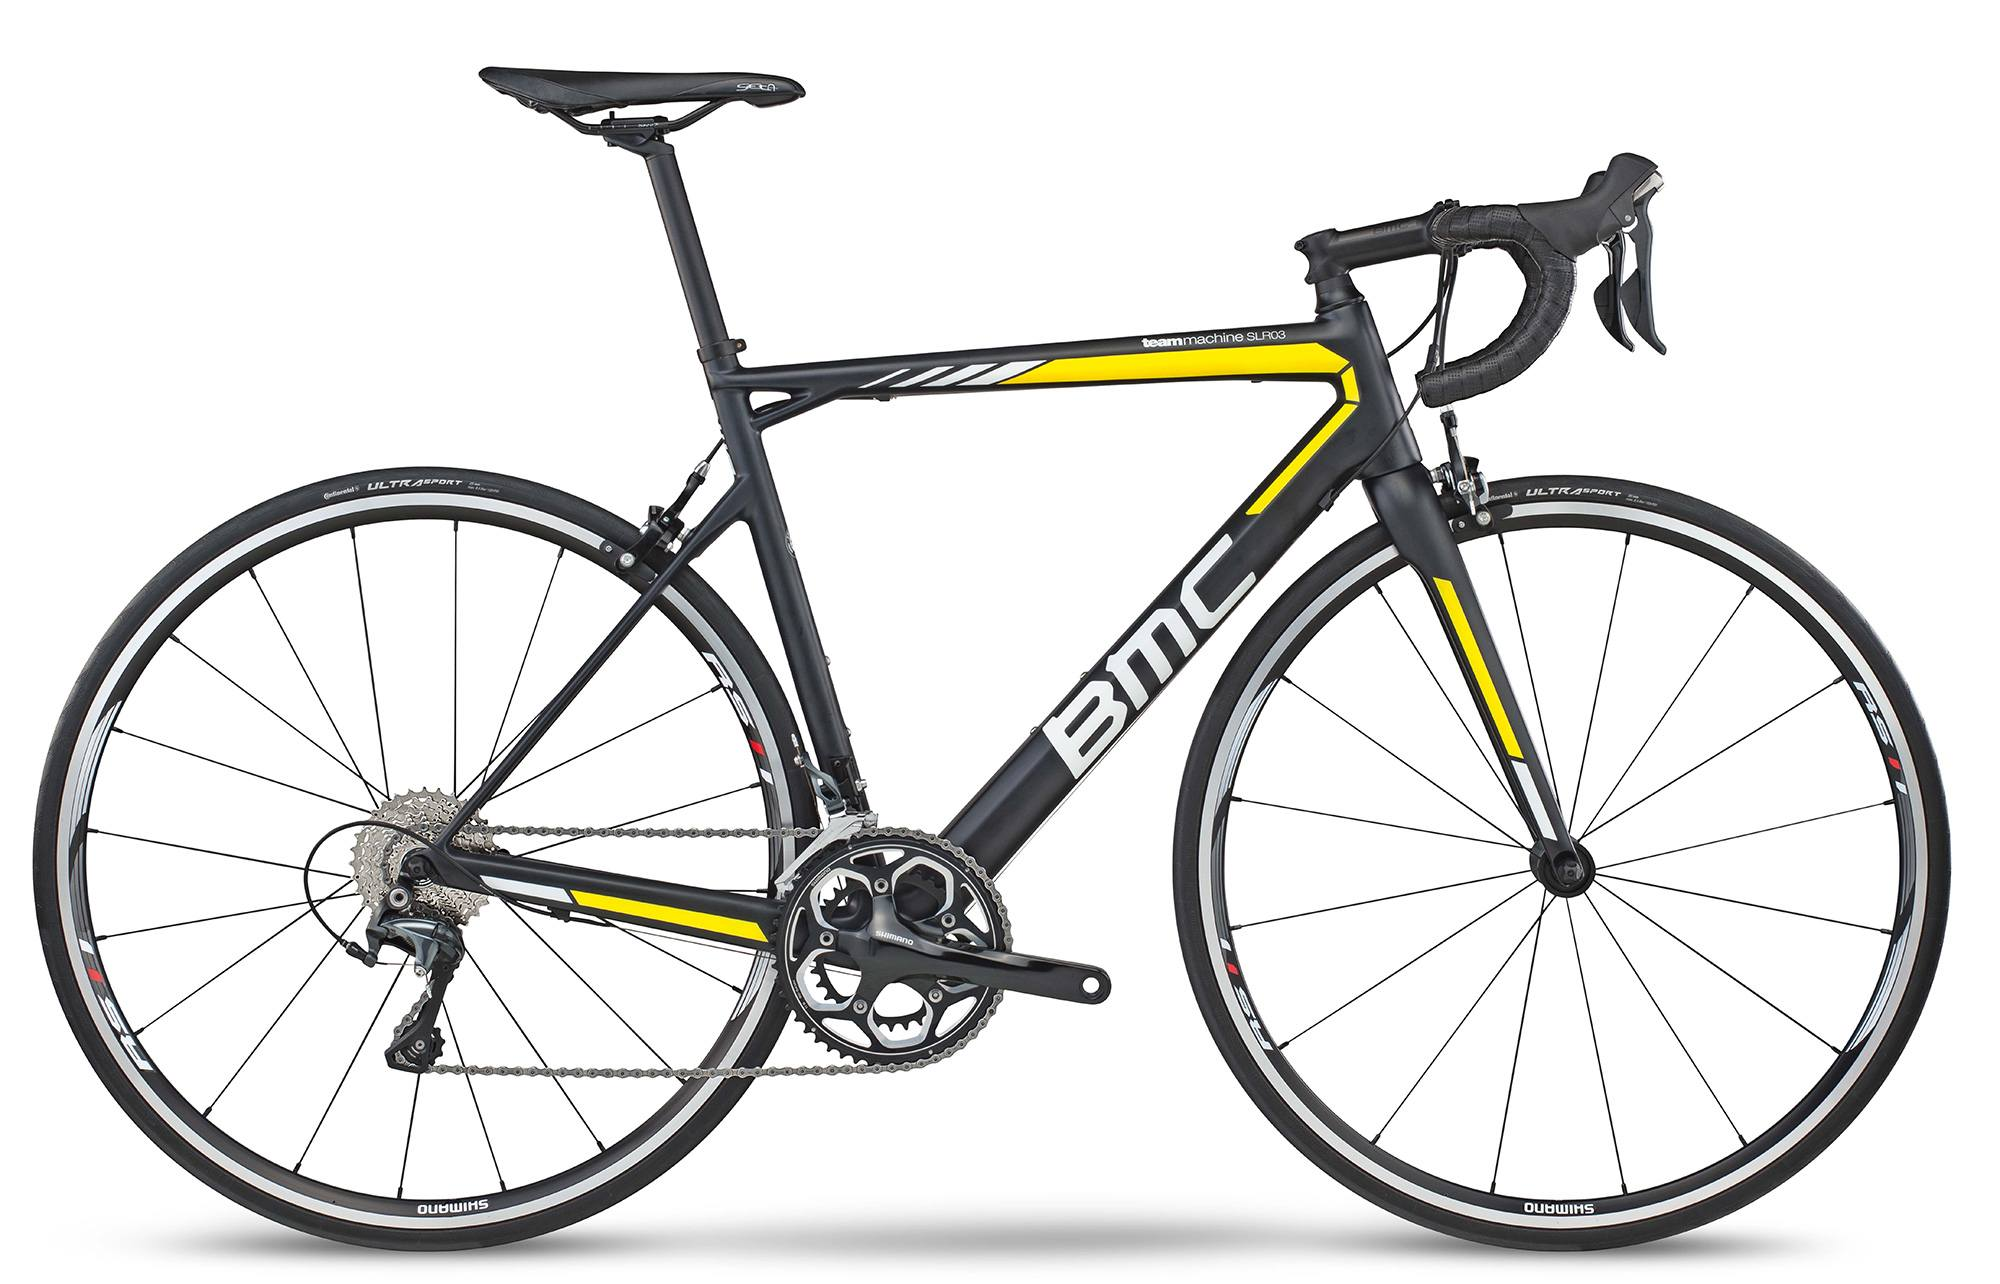 0a1cea9efc8 2017 BMC TeamMachine SLR03 Ultegra Bike | R&A Cycles